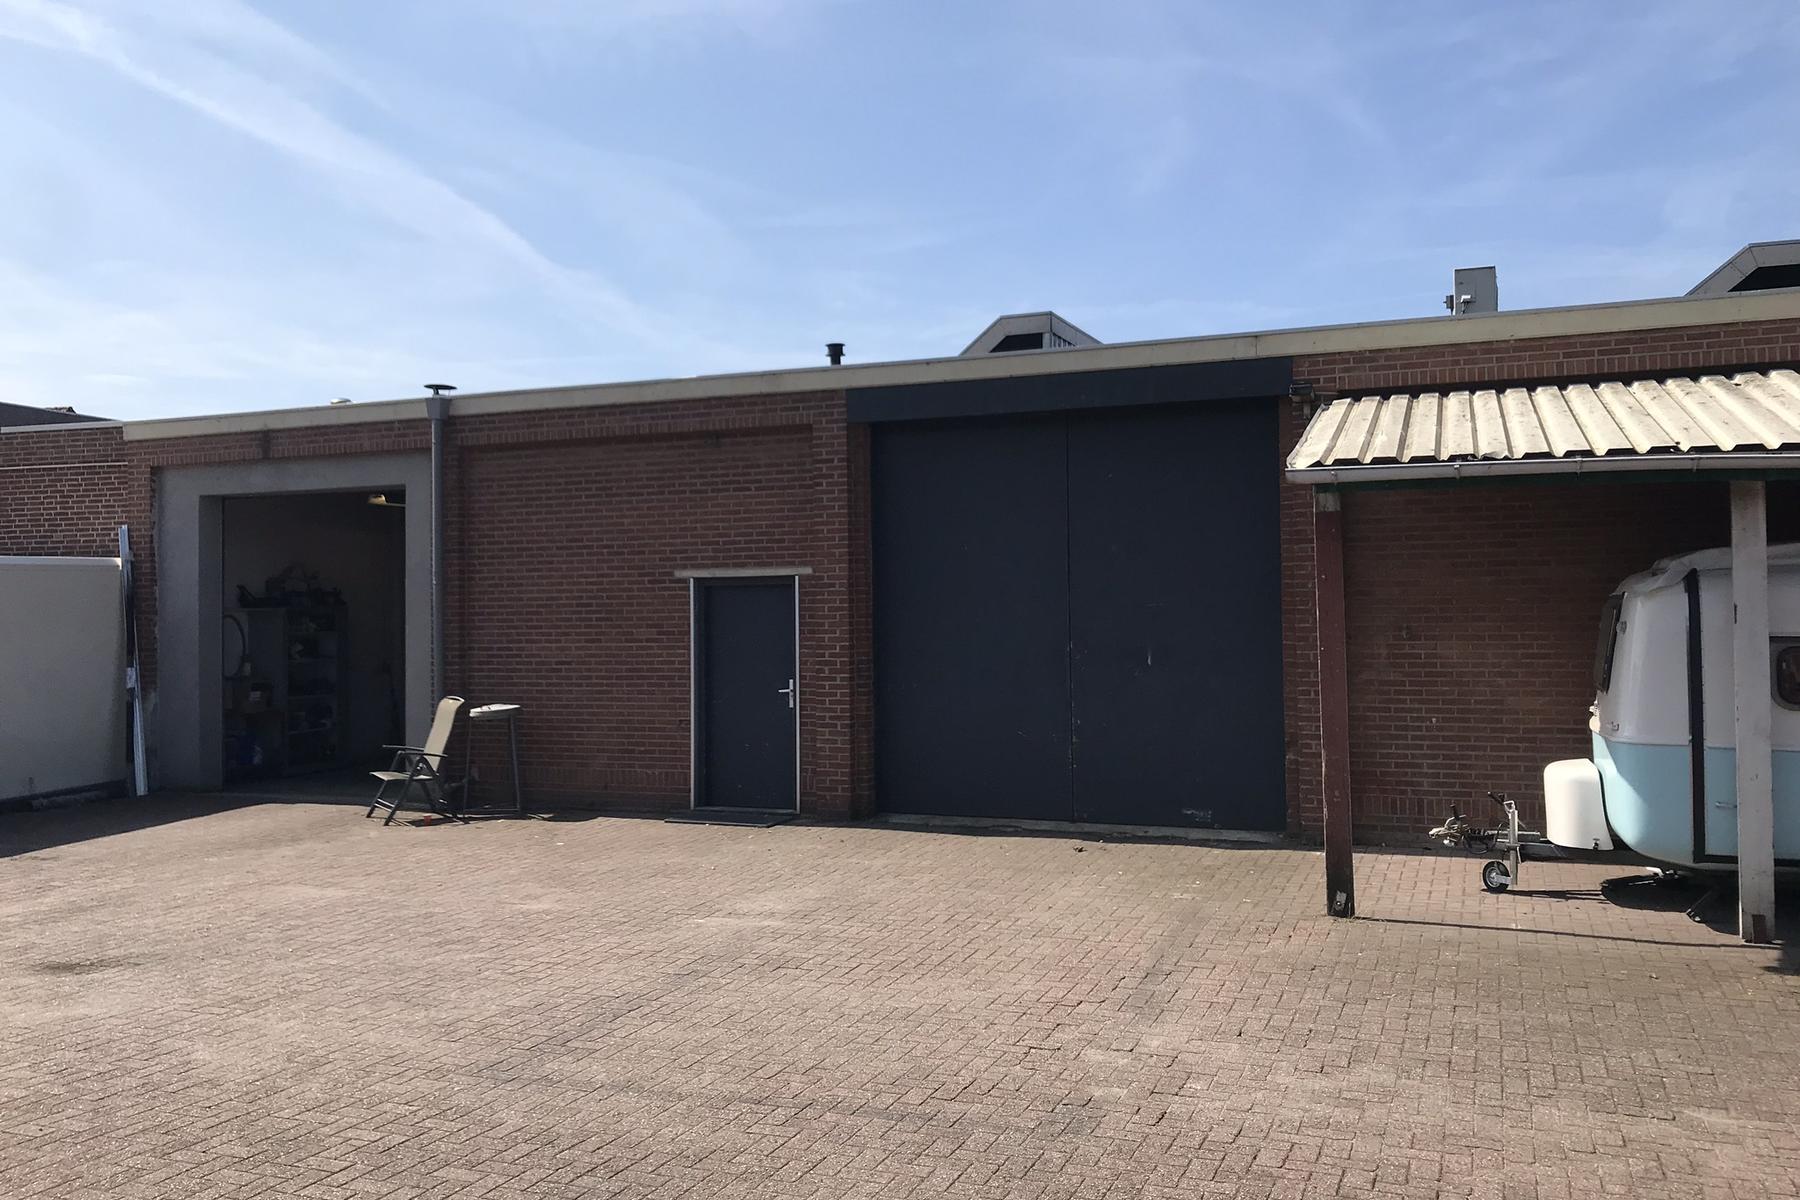 Burgemeester Van Aefferdenstraat 10 A in Venlo 5913 BG